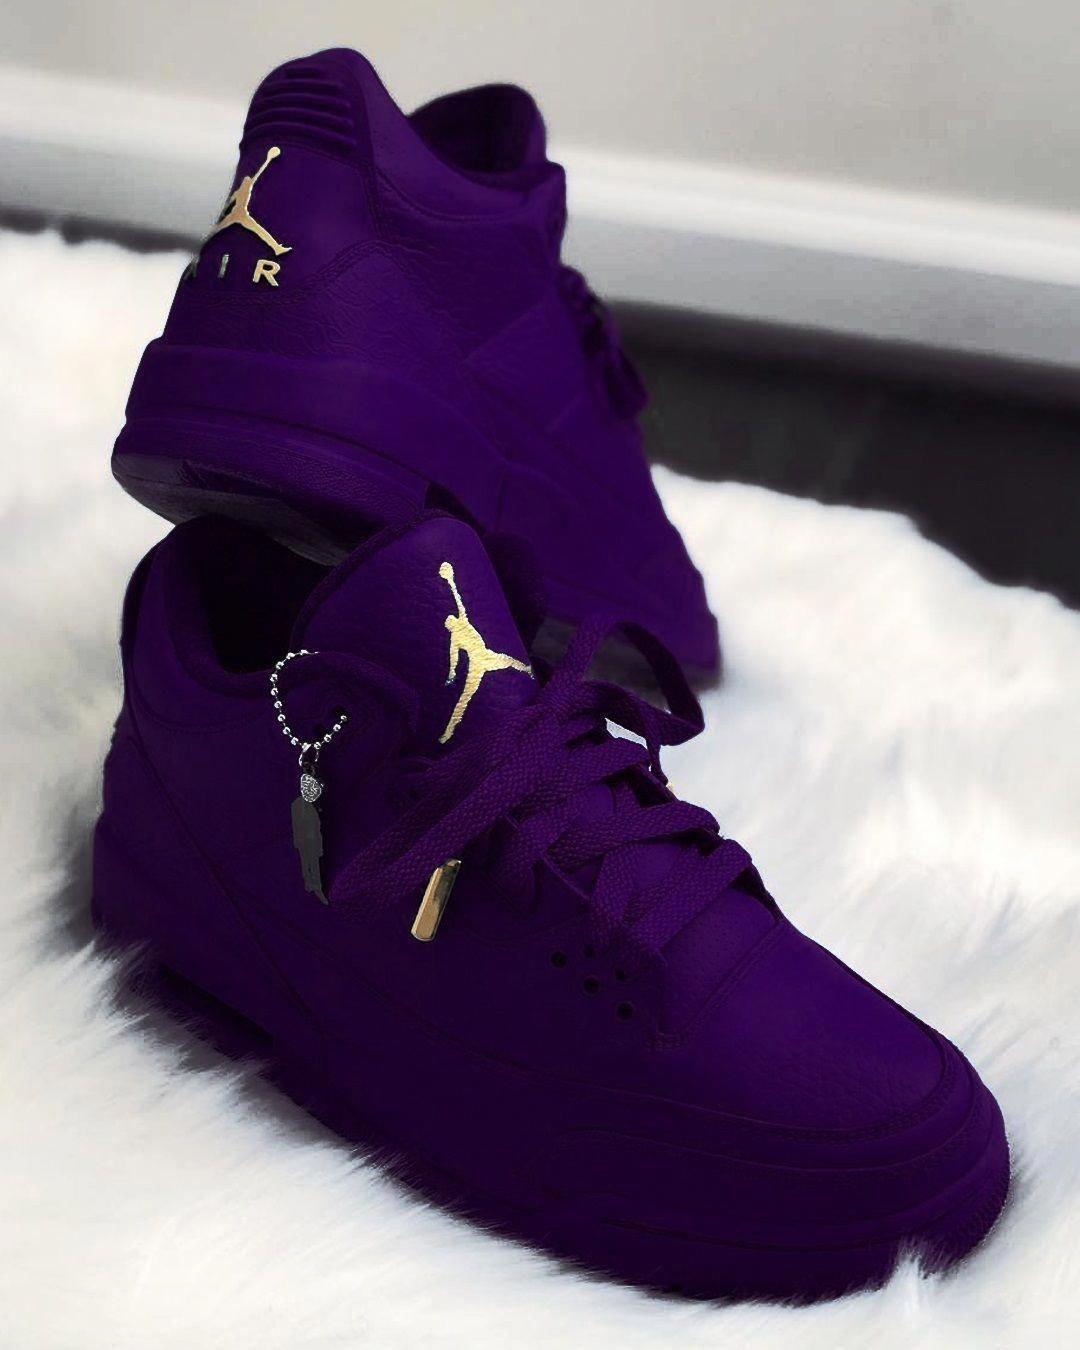 Women Shoes Canada #912WomenSShoesToMenS | Sneakers fashion ...